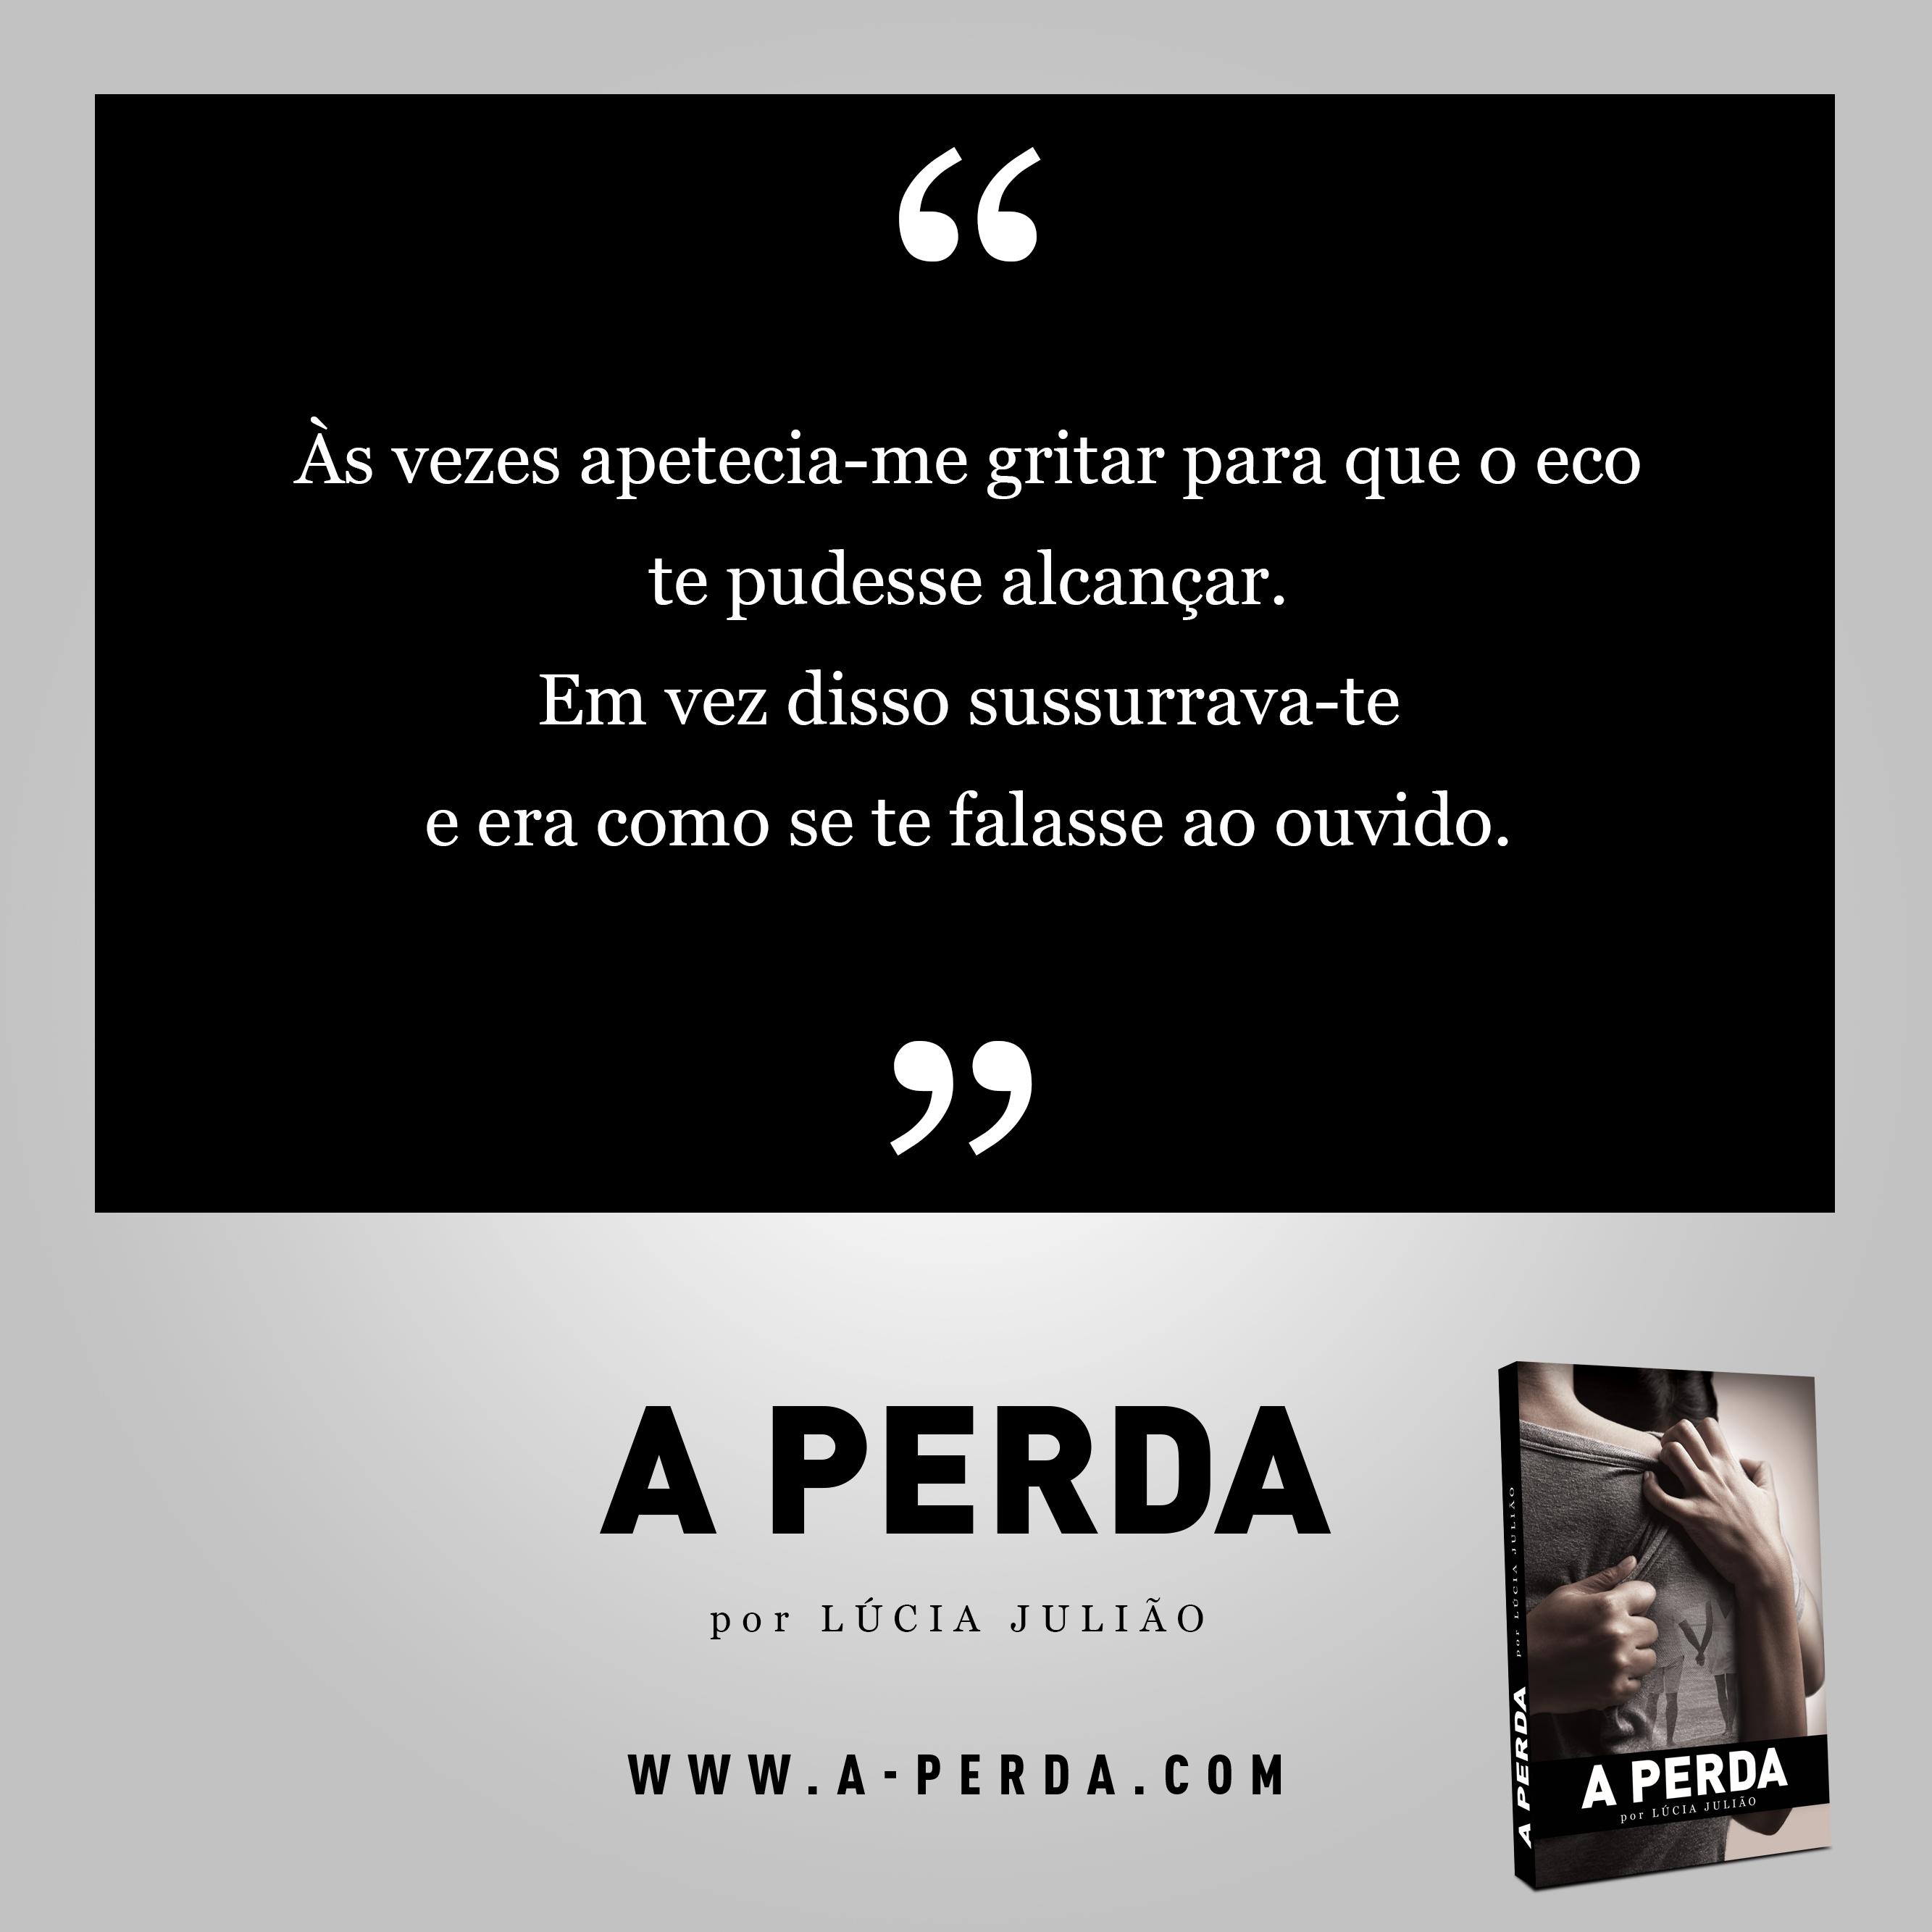 022-capitulo-11-livro-a-Perda-de-Lucia-Juliao-Instagram